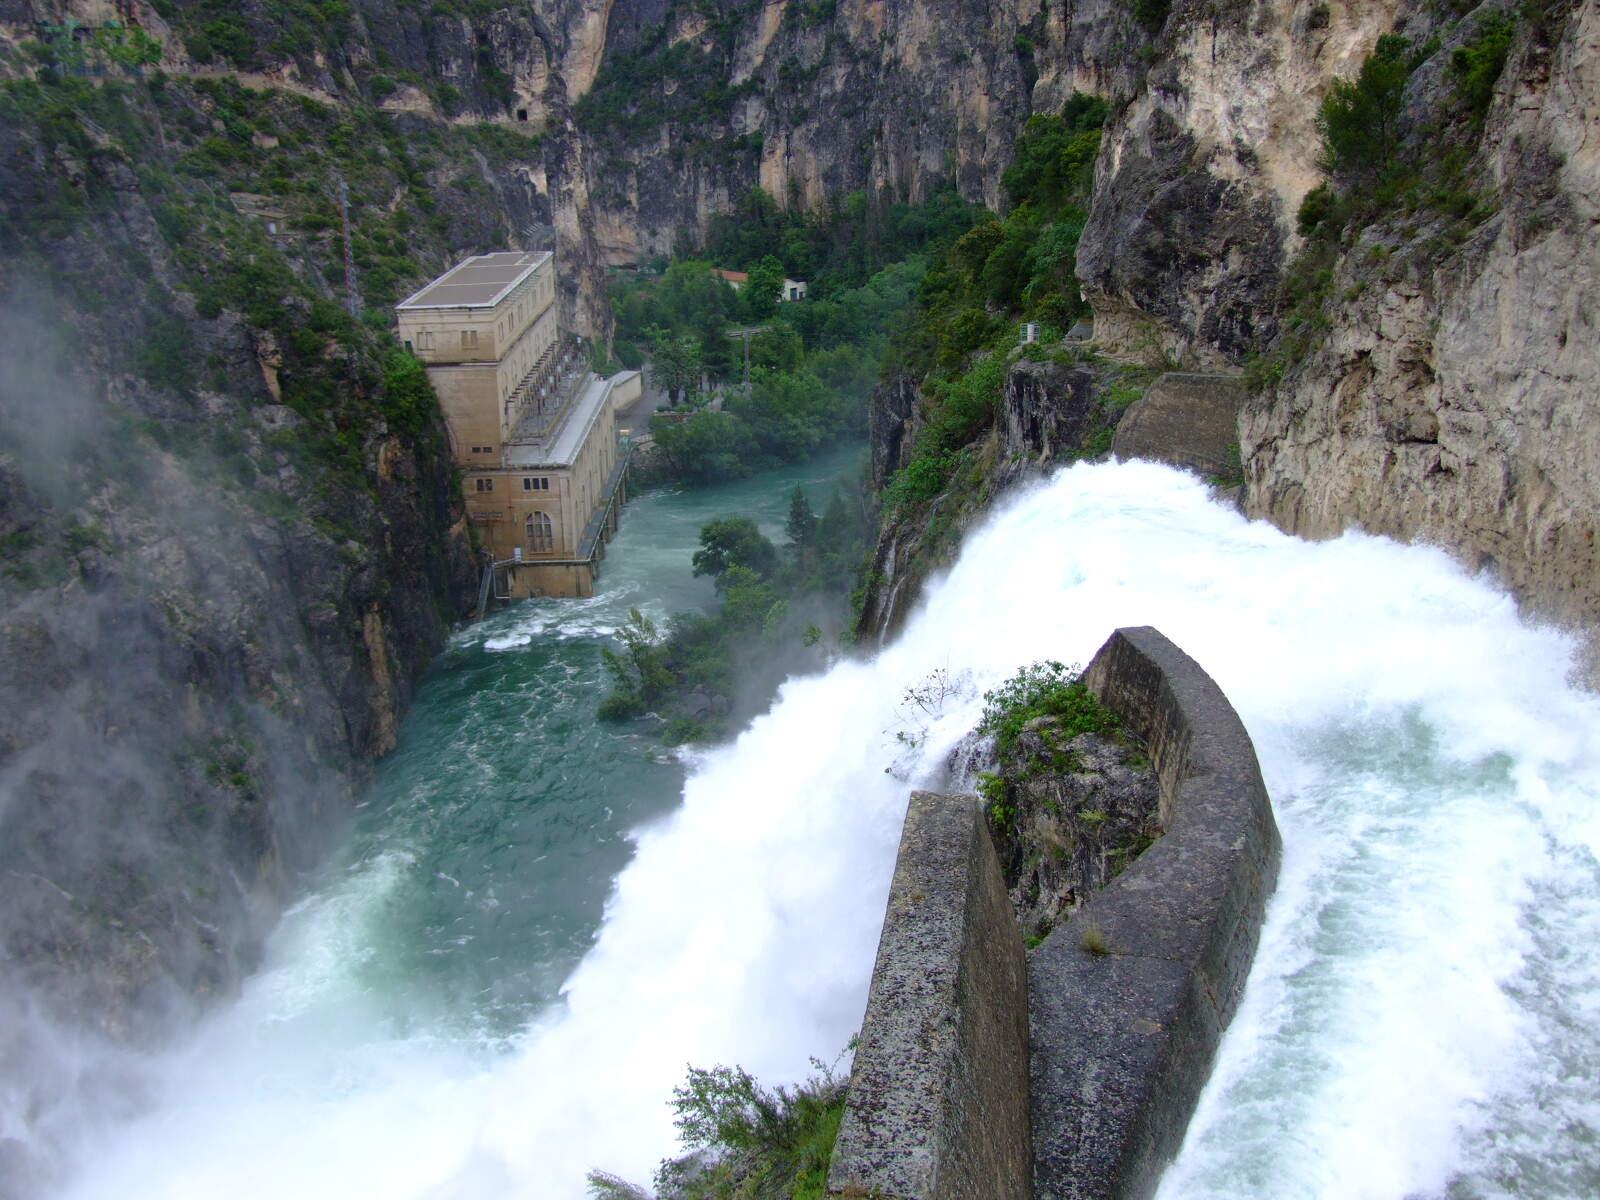 La central hidroelèctrica de Camarasa desembassant